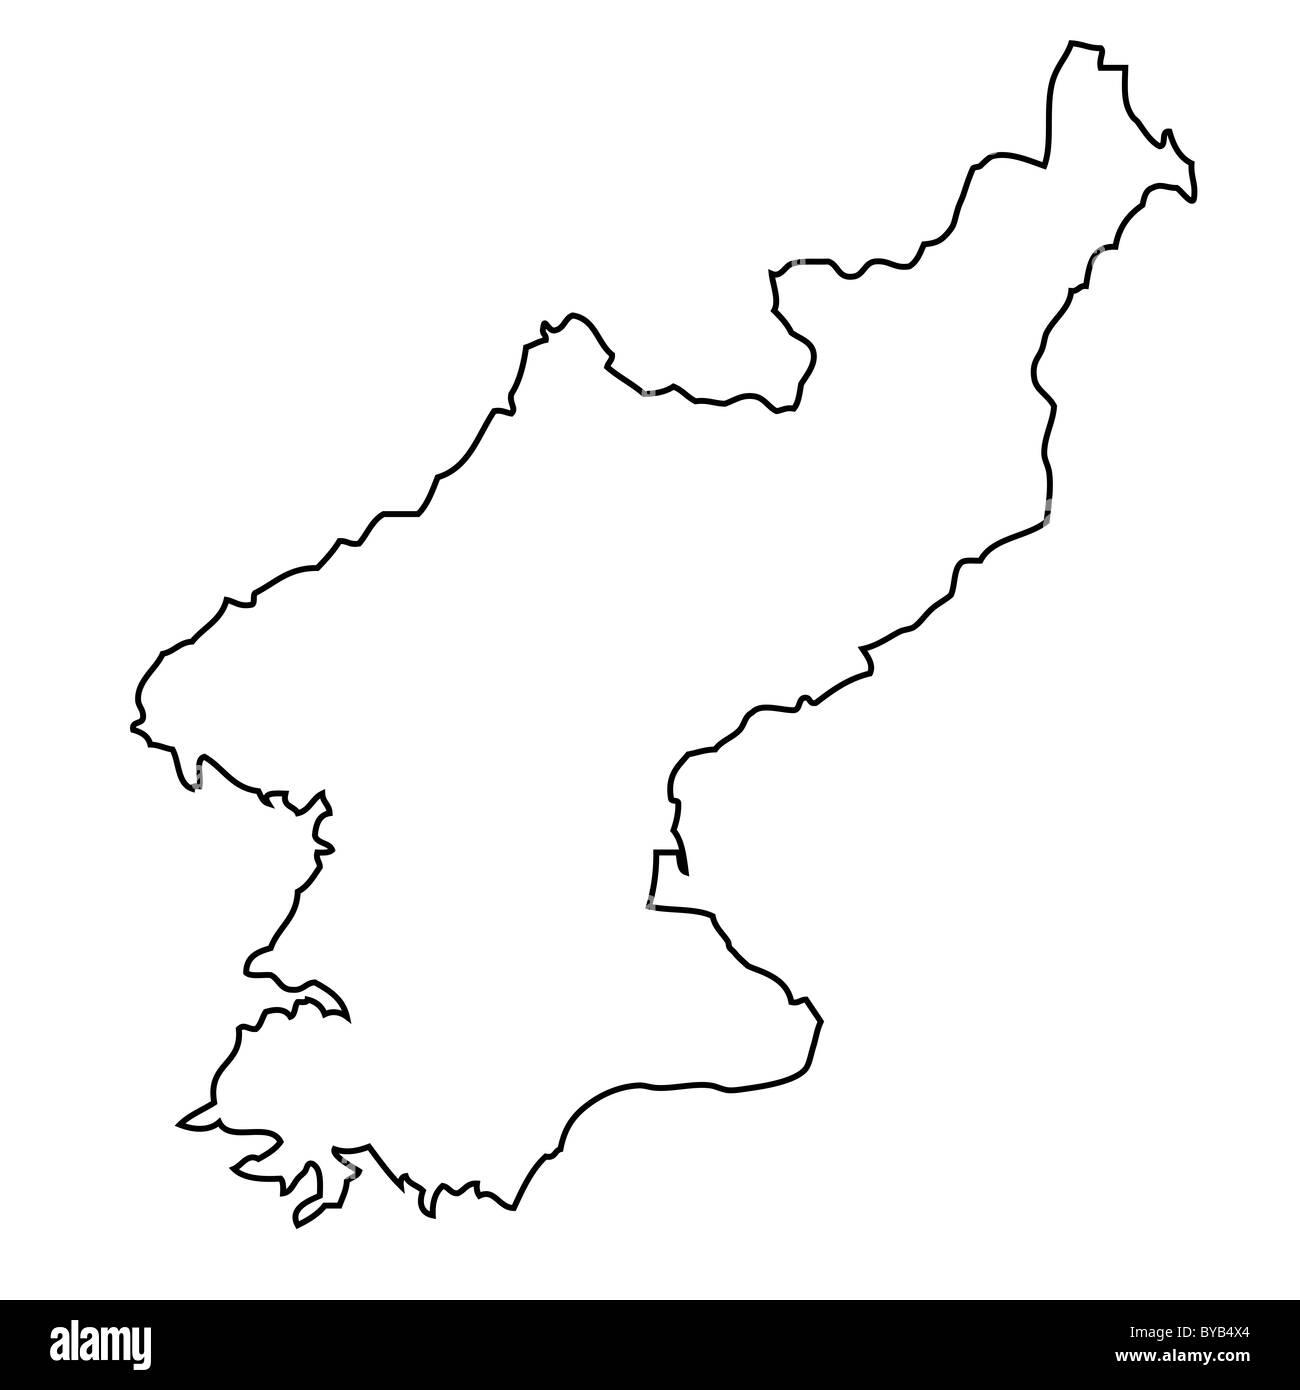 Outline Map Of North Korea Stock Photo 34051420 Alamy